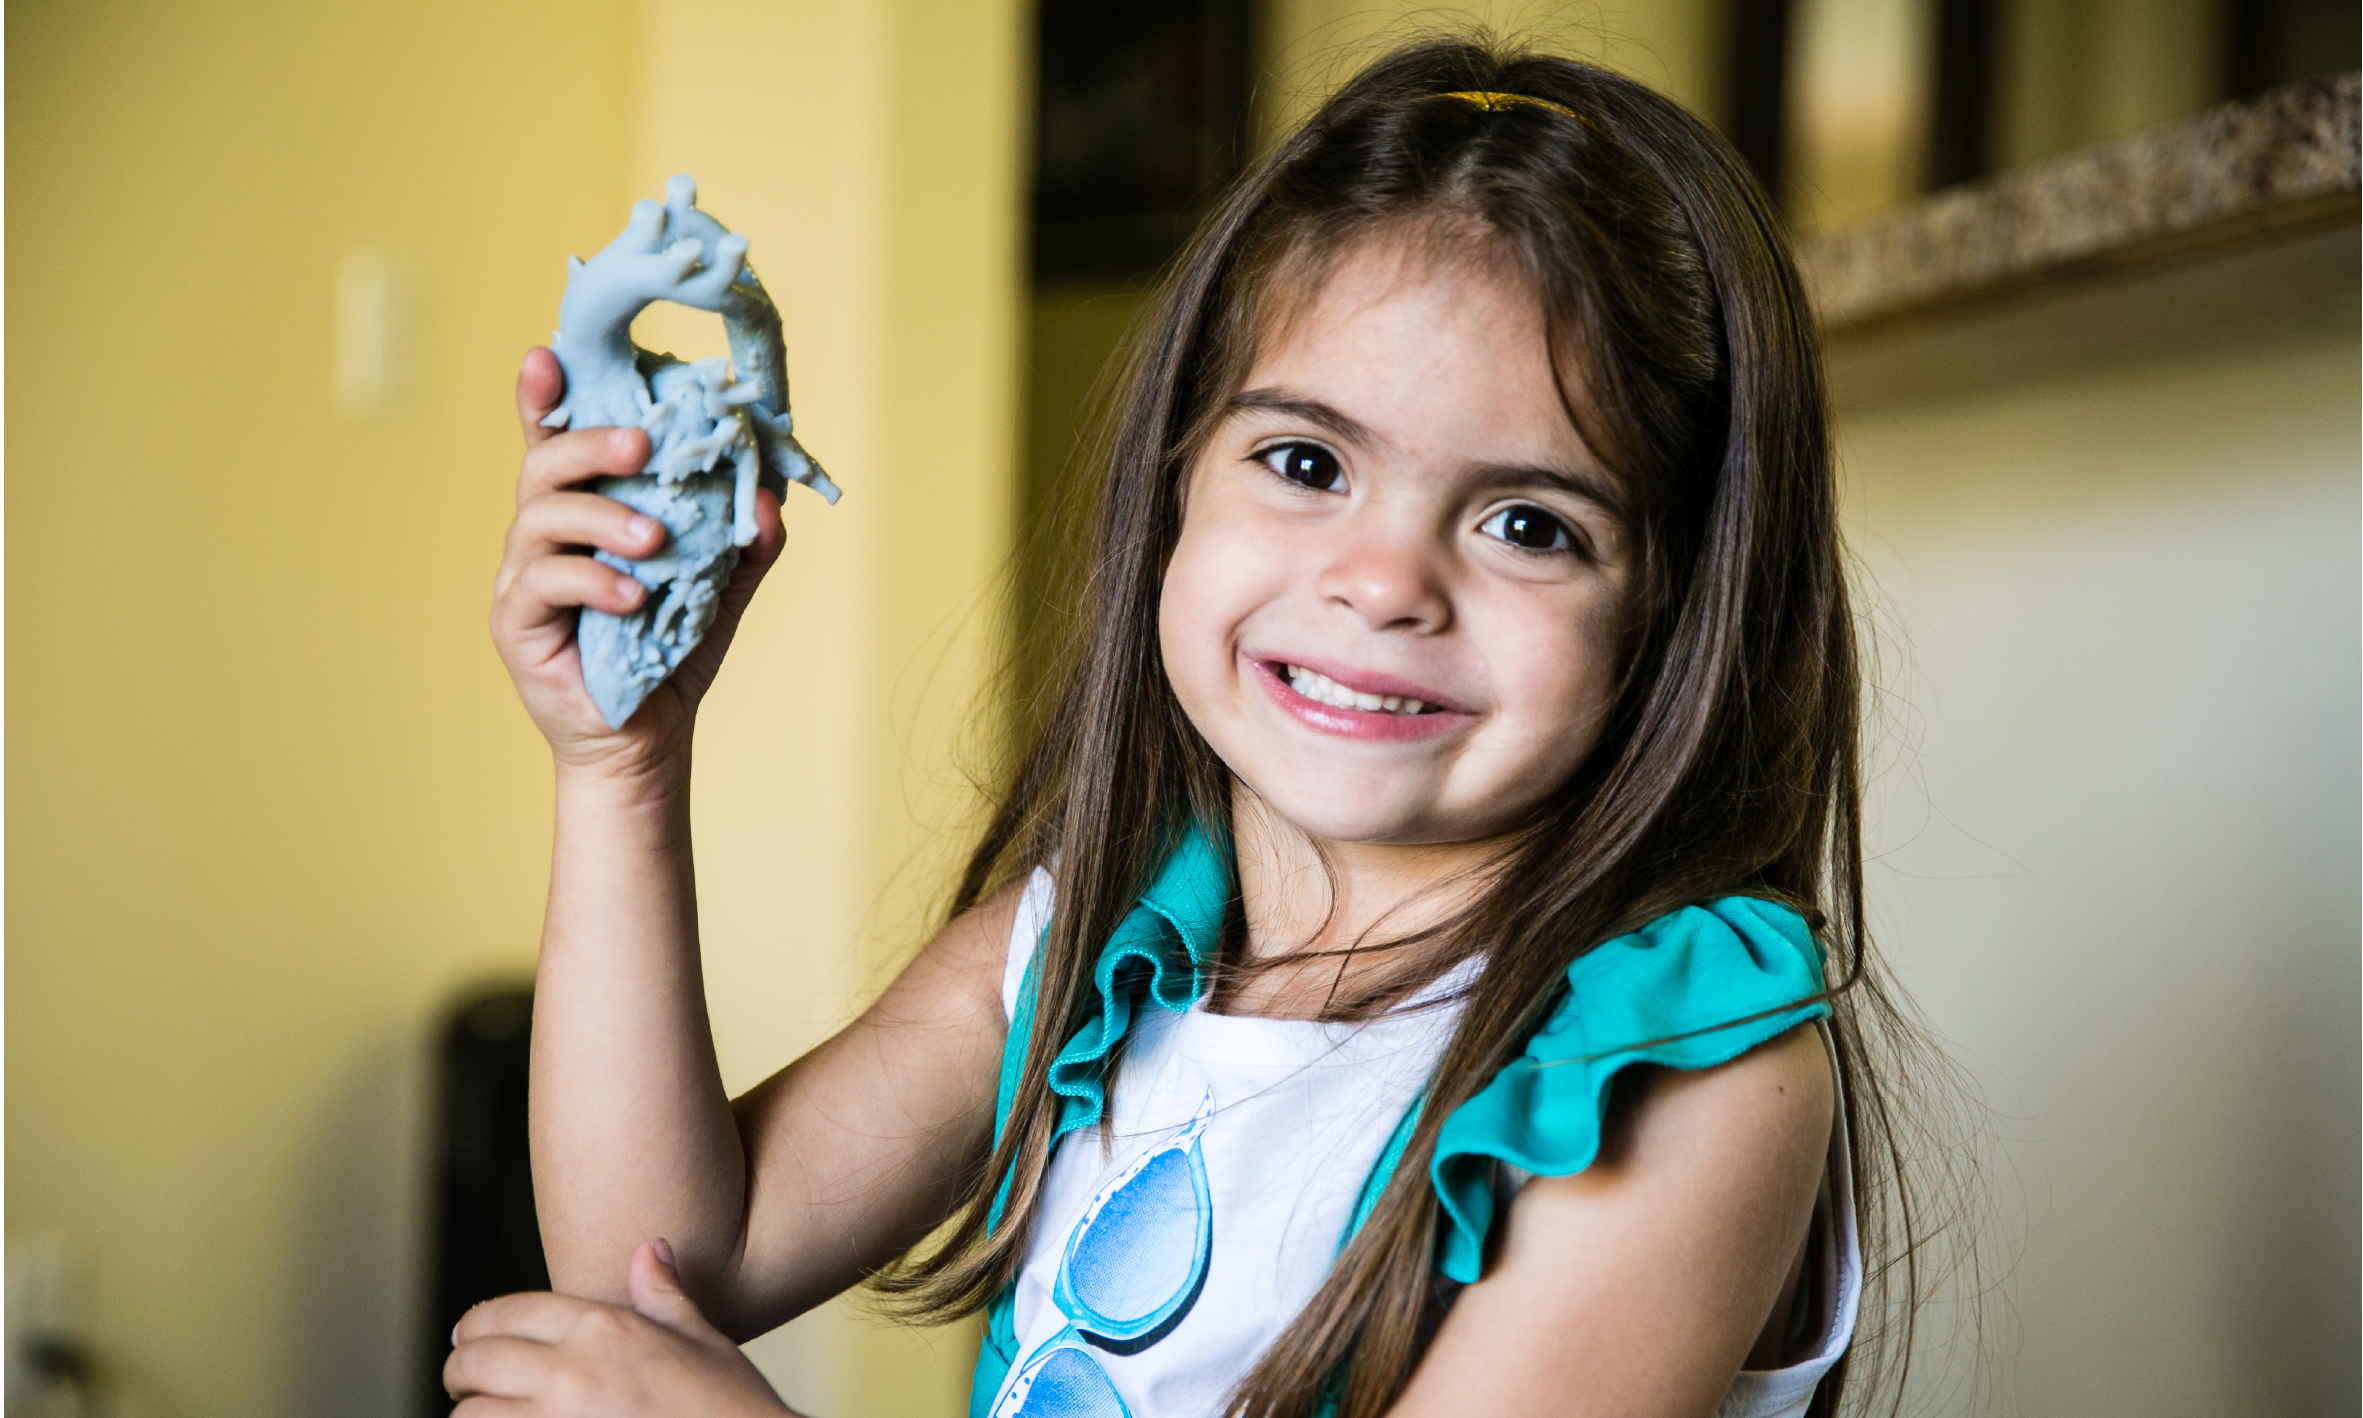 Mia 患有主動脈雙弓缺陷,長期呼吸不暢。醫生利用 3D 列印心臟模型找到了最佳修復方案。